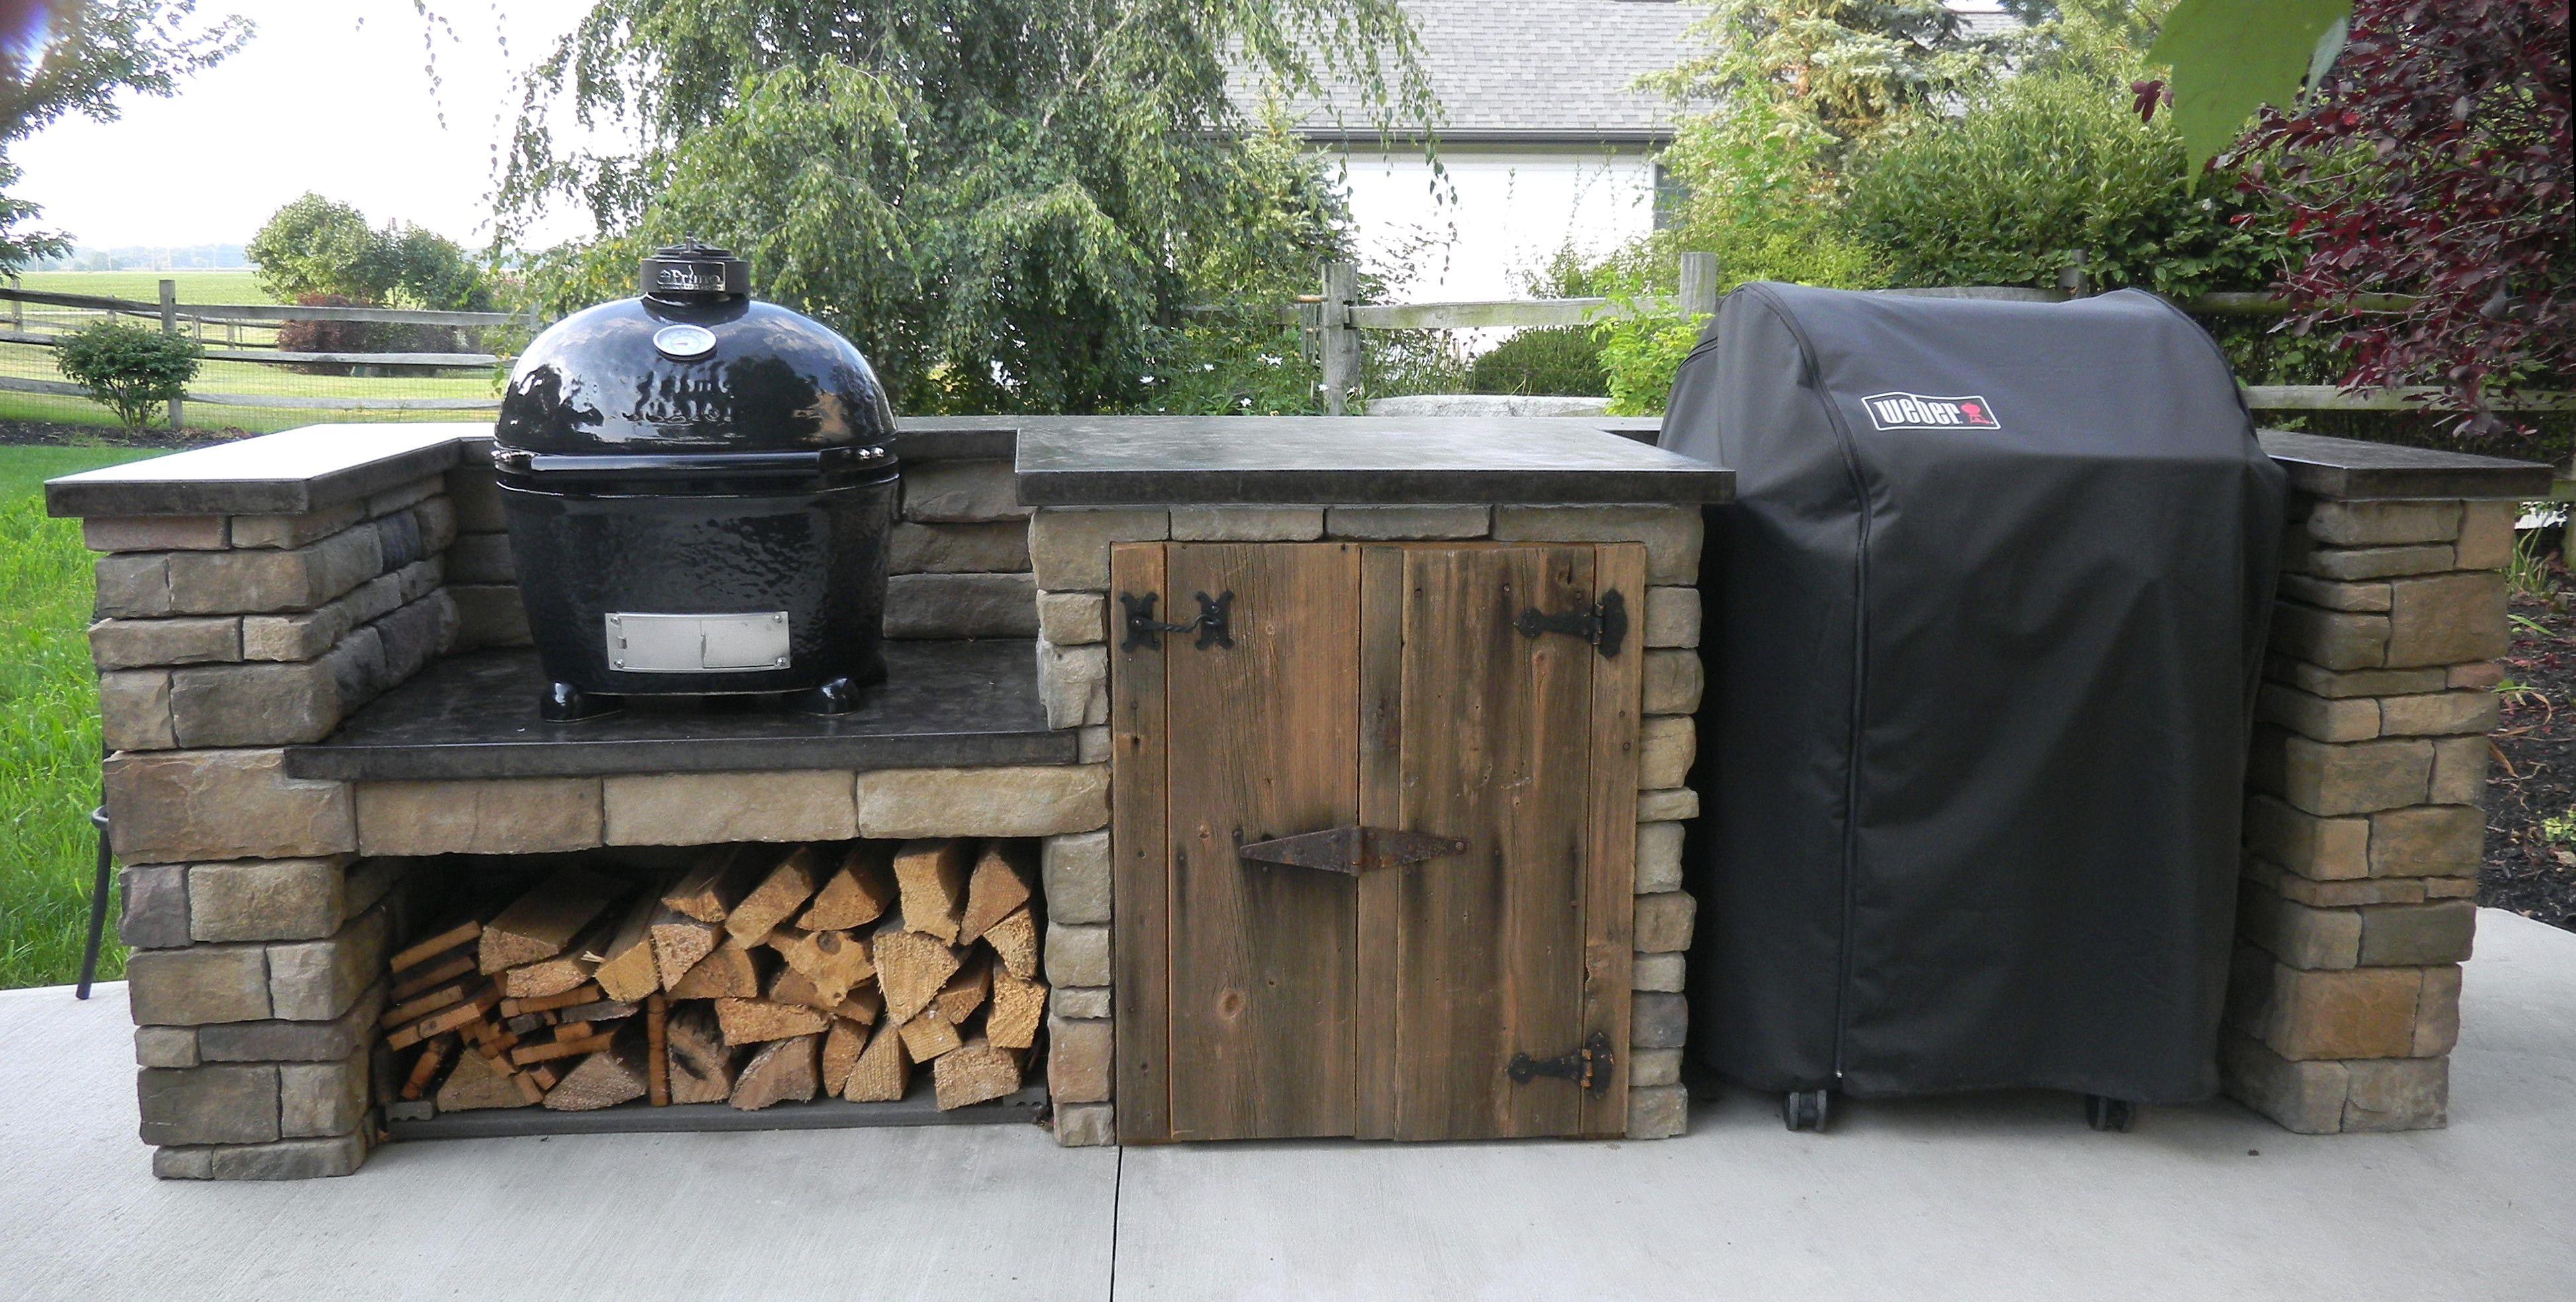 Best Charcoal Grill Smoker Combo That You Can Buy Under 300 Parrilla Exterior Cocina Al Aire Libre Asador